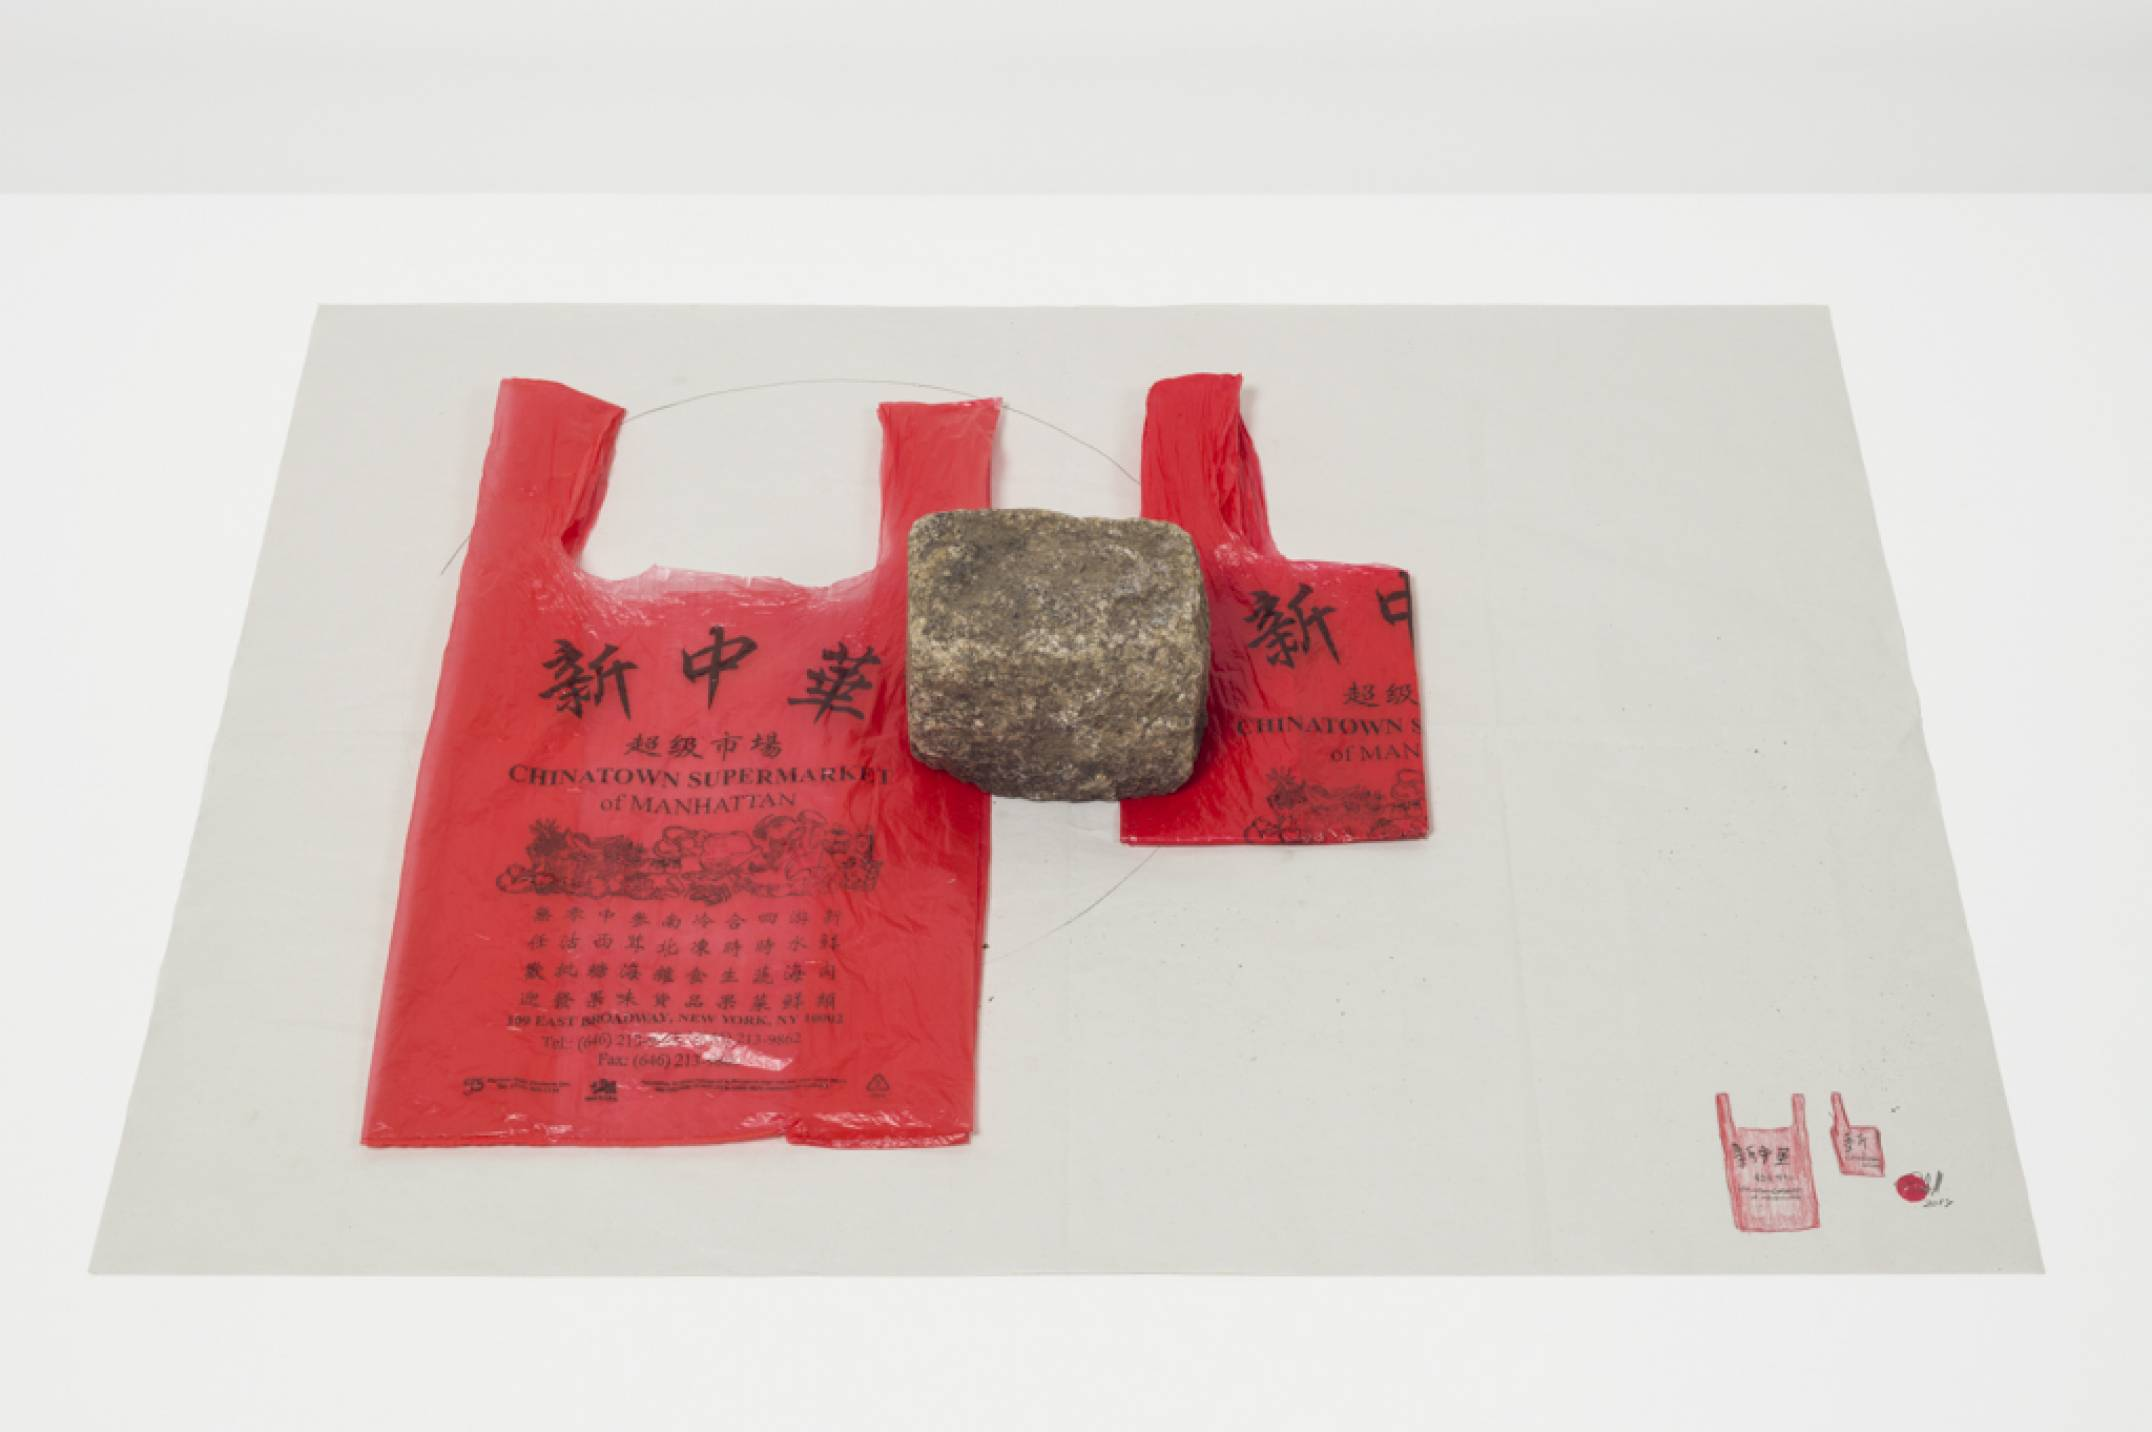 Paulo Nazareth,<em>CHINATOWN</em>, 2017, pencil on paper, stone, plastic bags, 12,7 × 94 × 70 cm - Mendes Wood DM